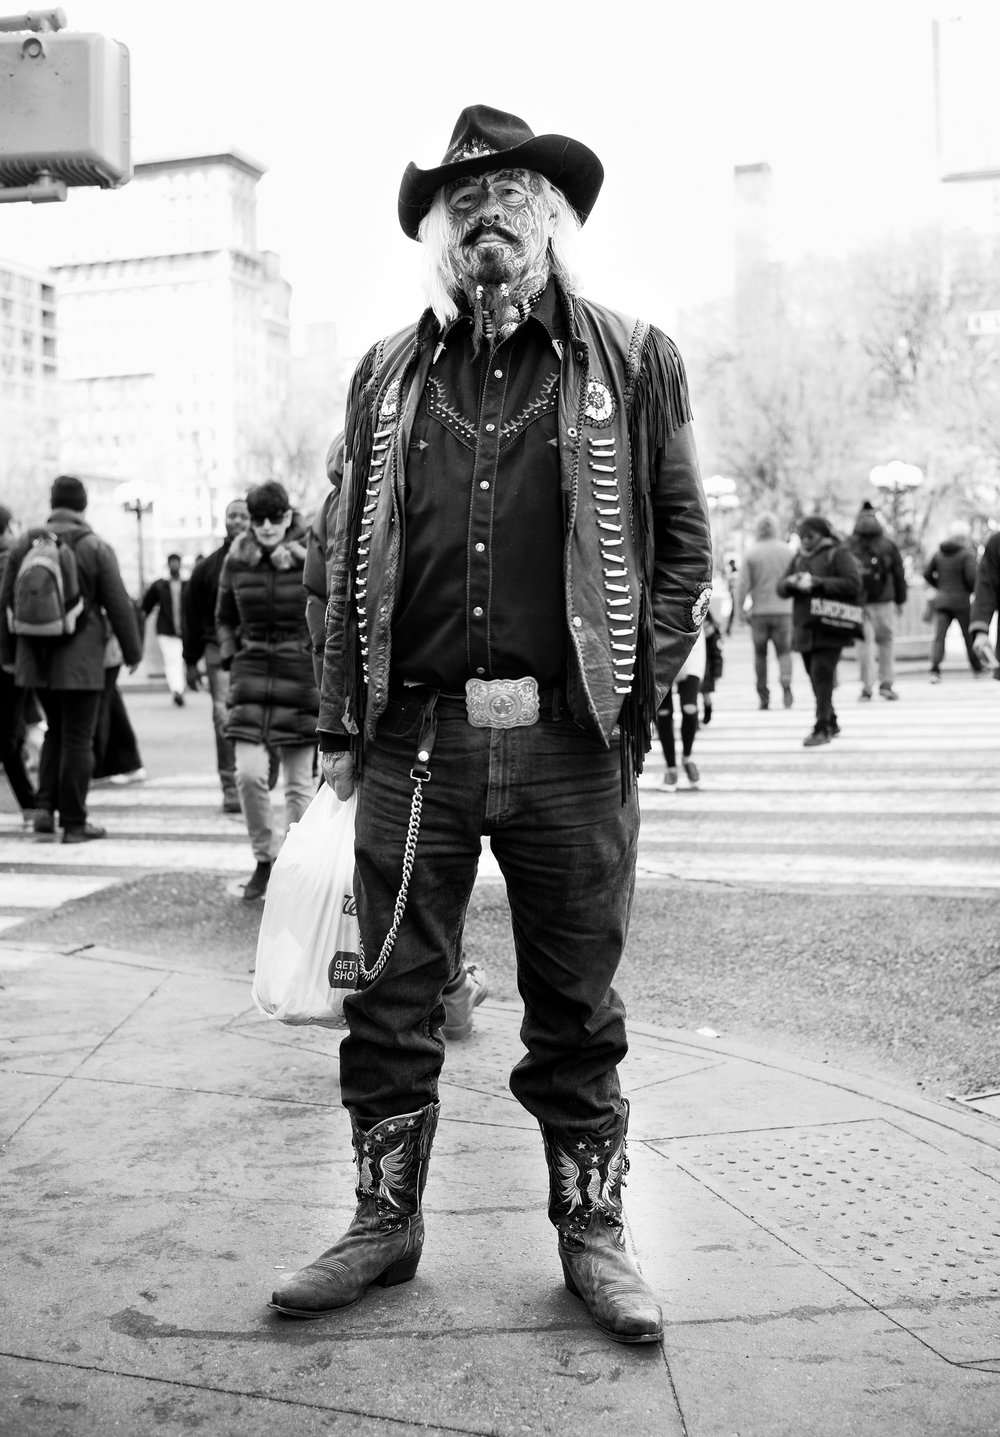 180405_New_Yorker_Portrait_001.jpg